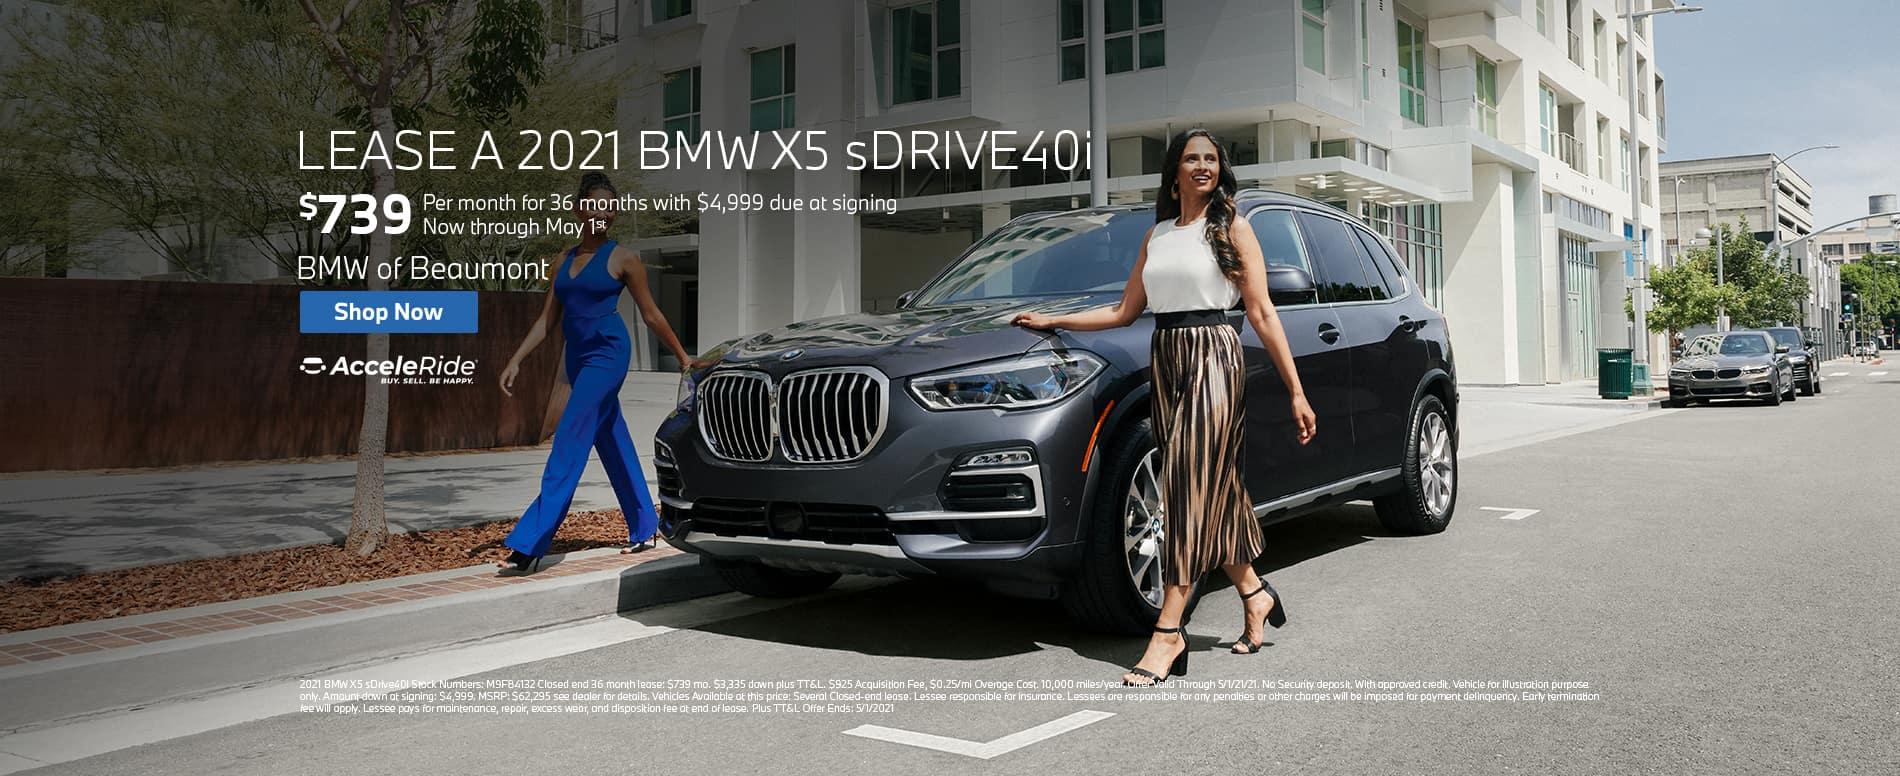 21APR_BMWB_21X5_WB_1900x776